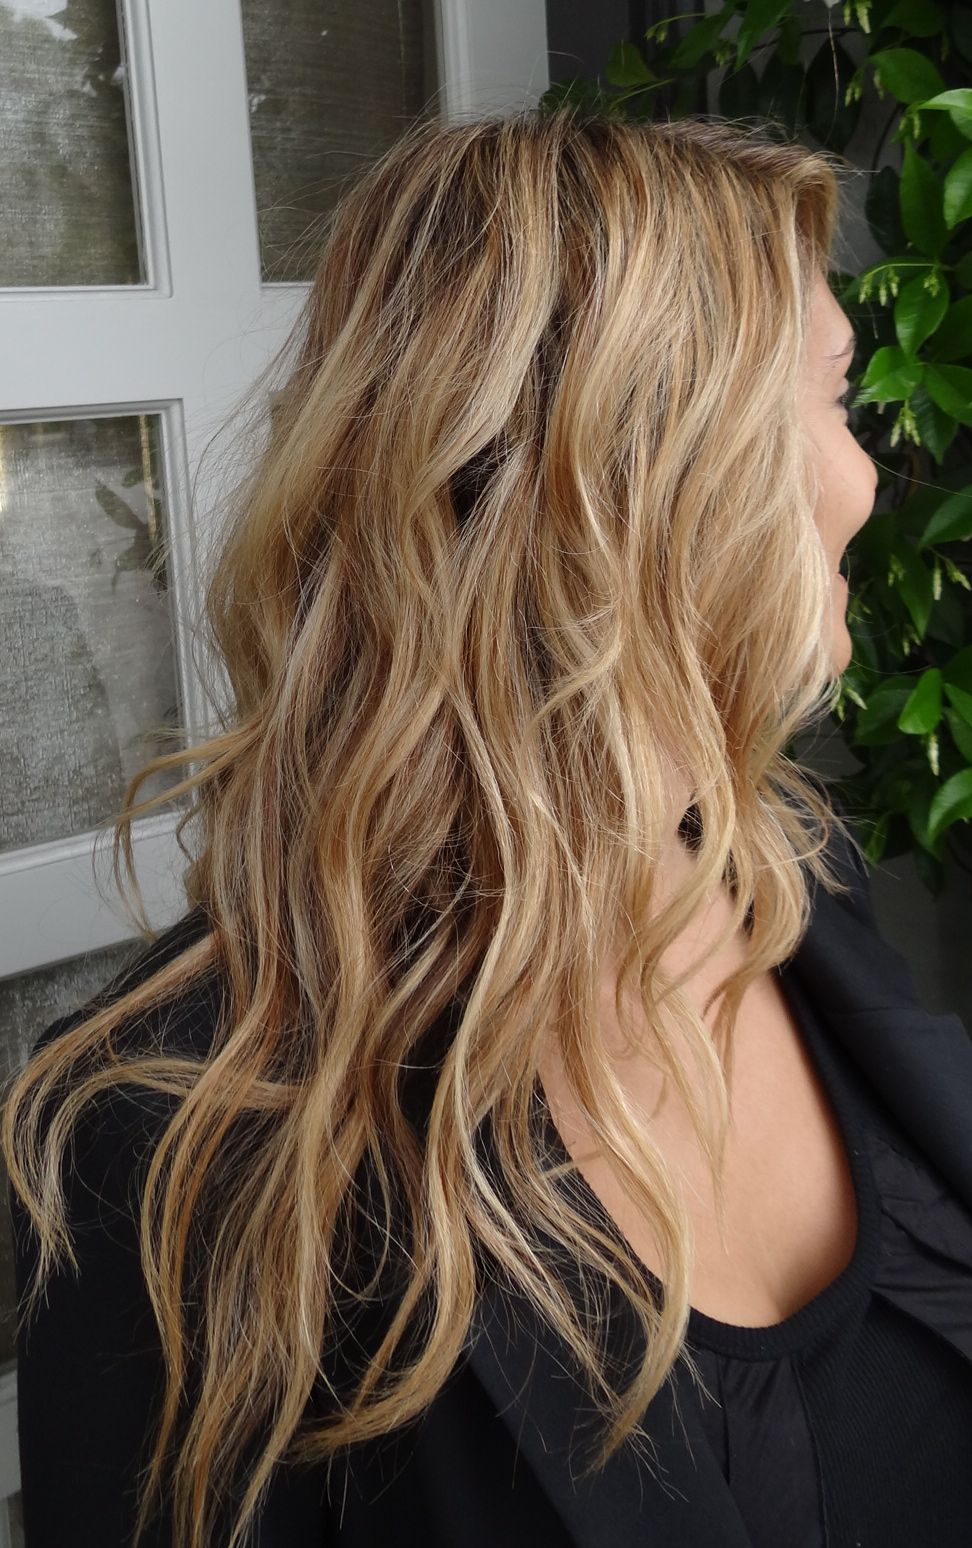 Natural blonde hair color Love hair Pinterest Hair Blonde